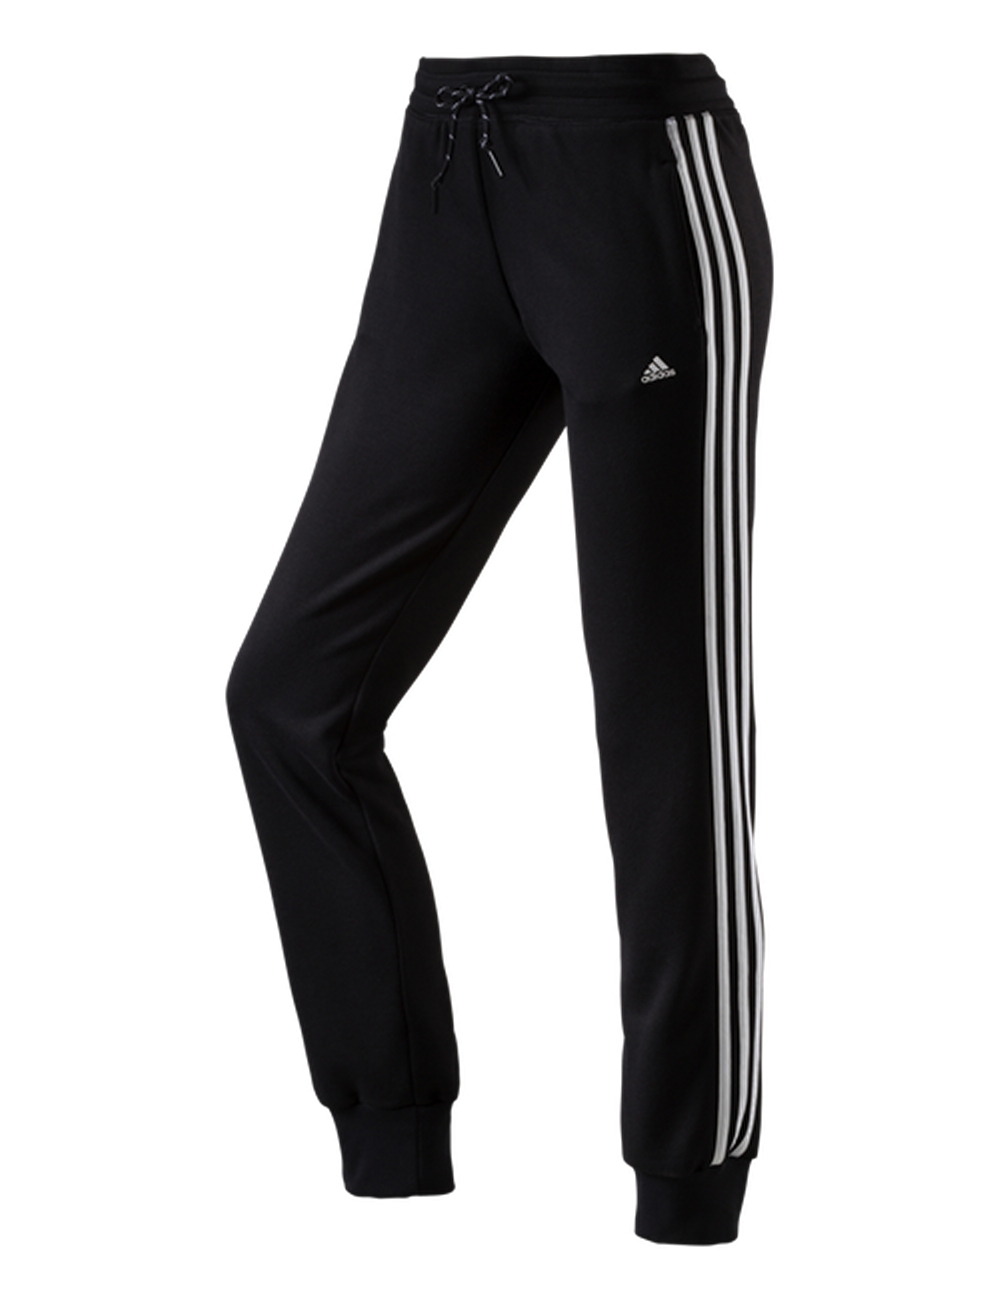 adidas damen trainingshose ess knit pants 3s schwarz wei. Black Bedroom Furniture Sets. Home Design Ideas